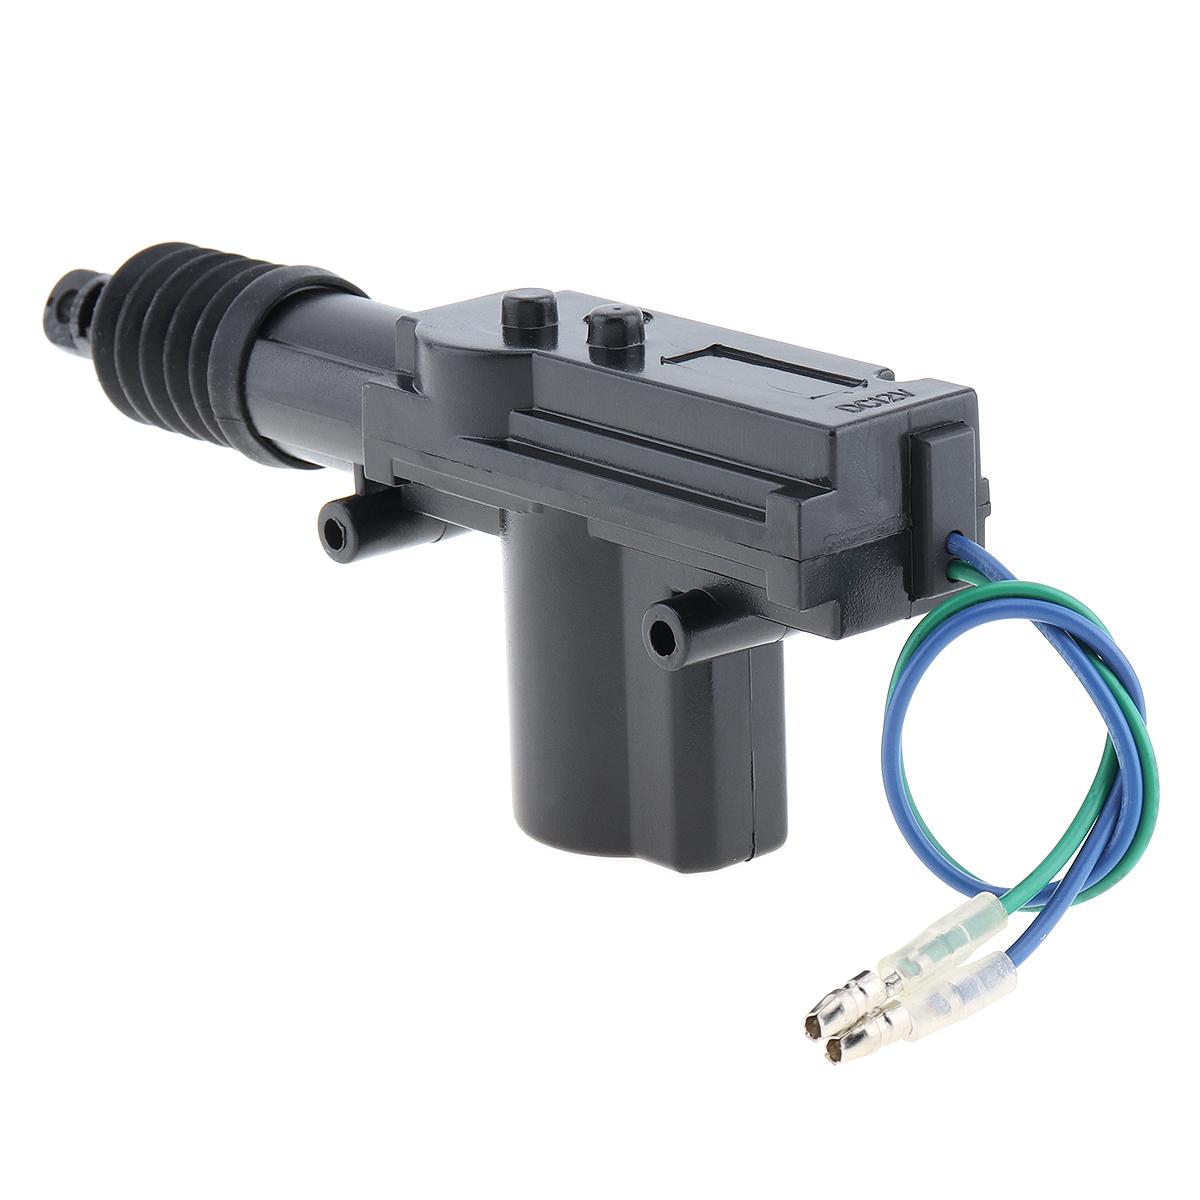 Automobiles & Motorcycles Universal Dc 12v 2 Wire Car Auto Truck Heavy Duty Power Door Lock Actuator Motor